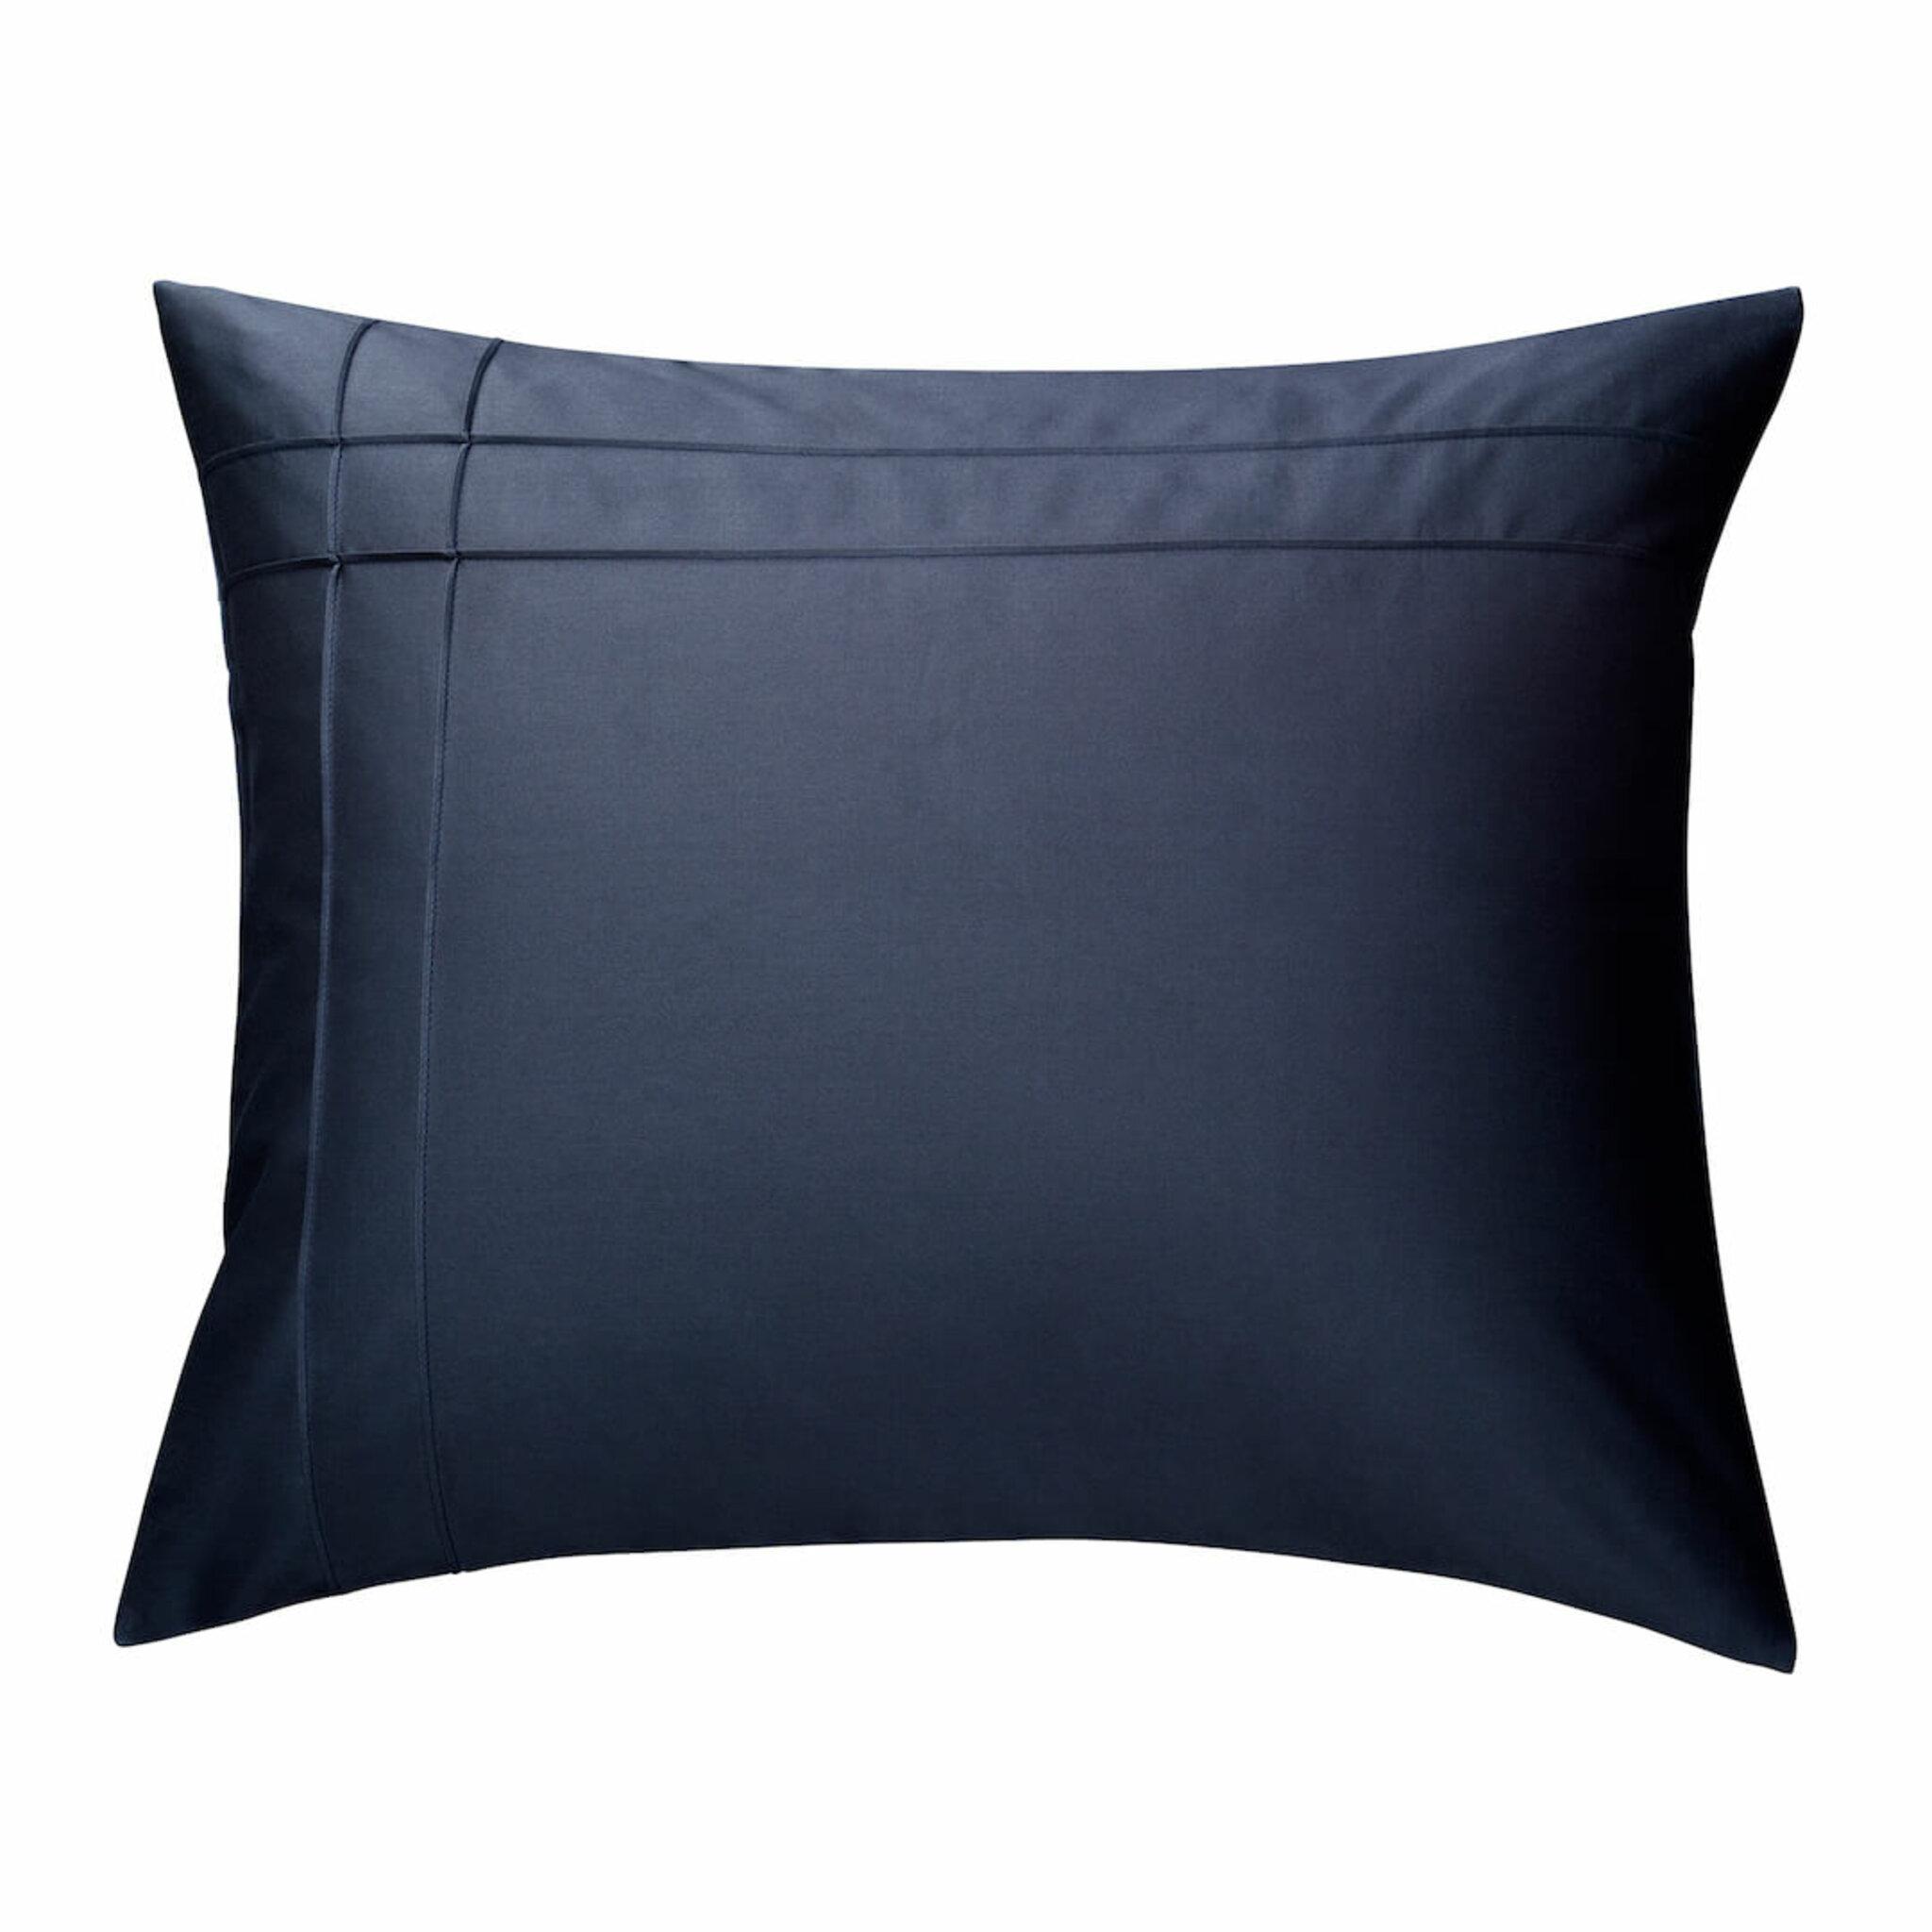 Deco Set Of Two Medium Pillowcase, 50x60 cm